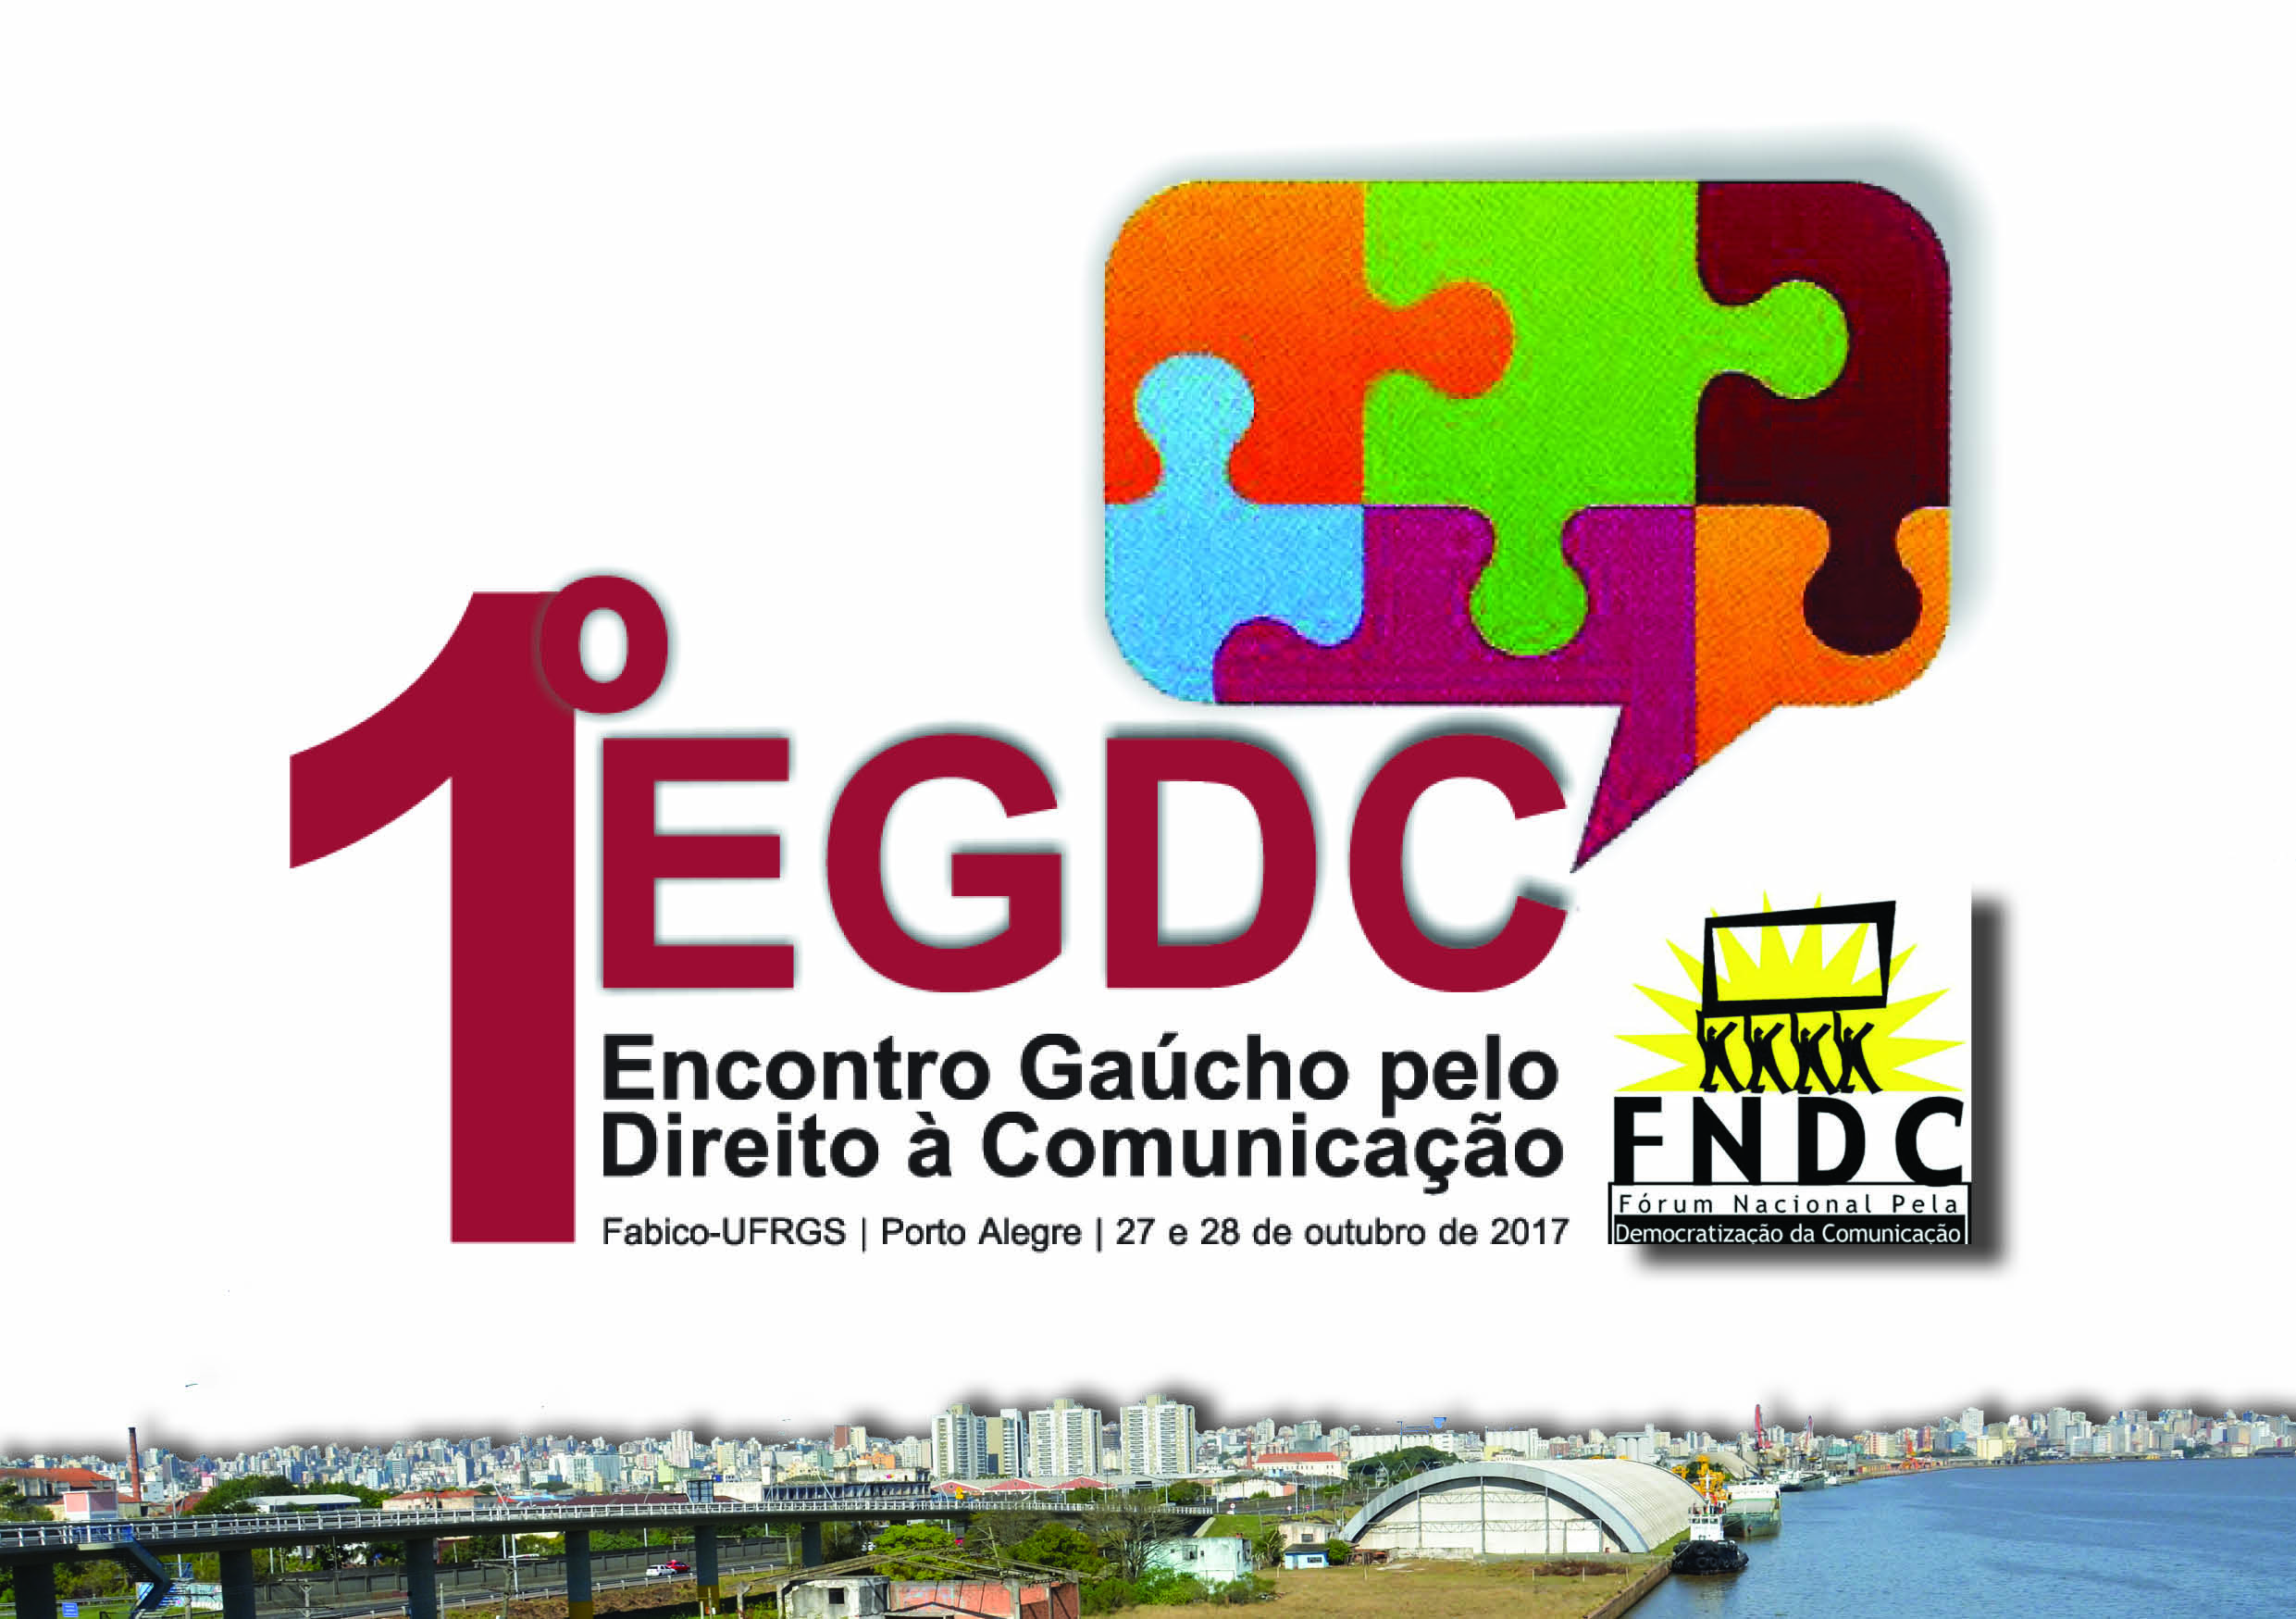 Capa folder EGDC final